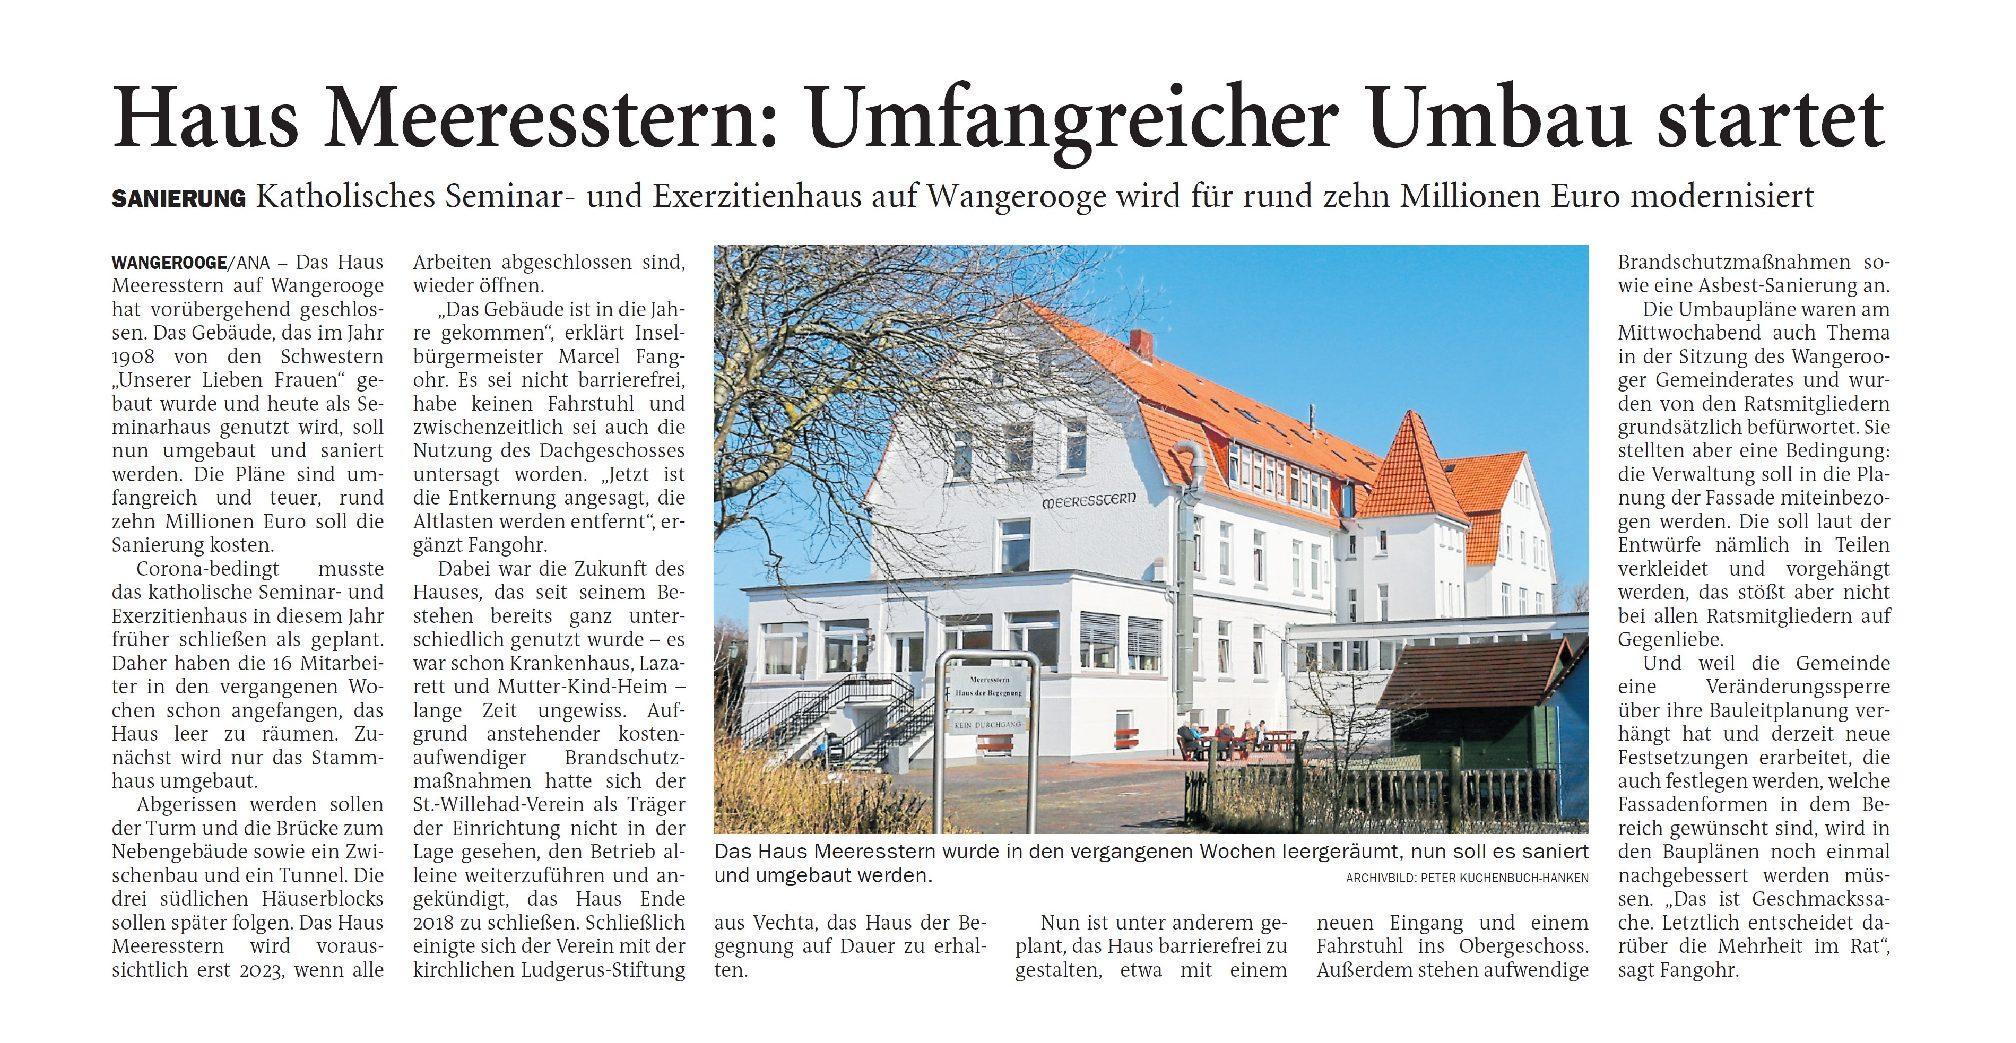 Jeversches Wochenblatt 28.11.2020 III